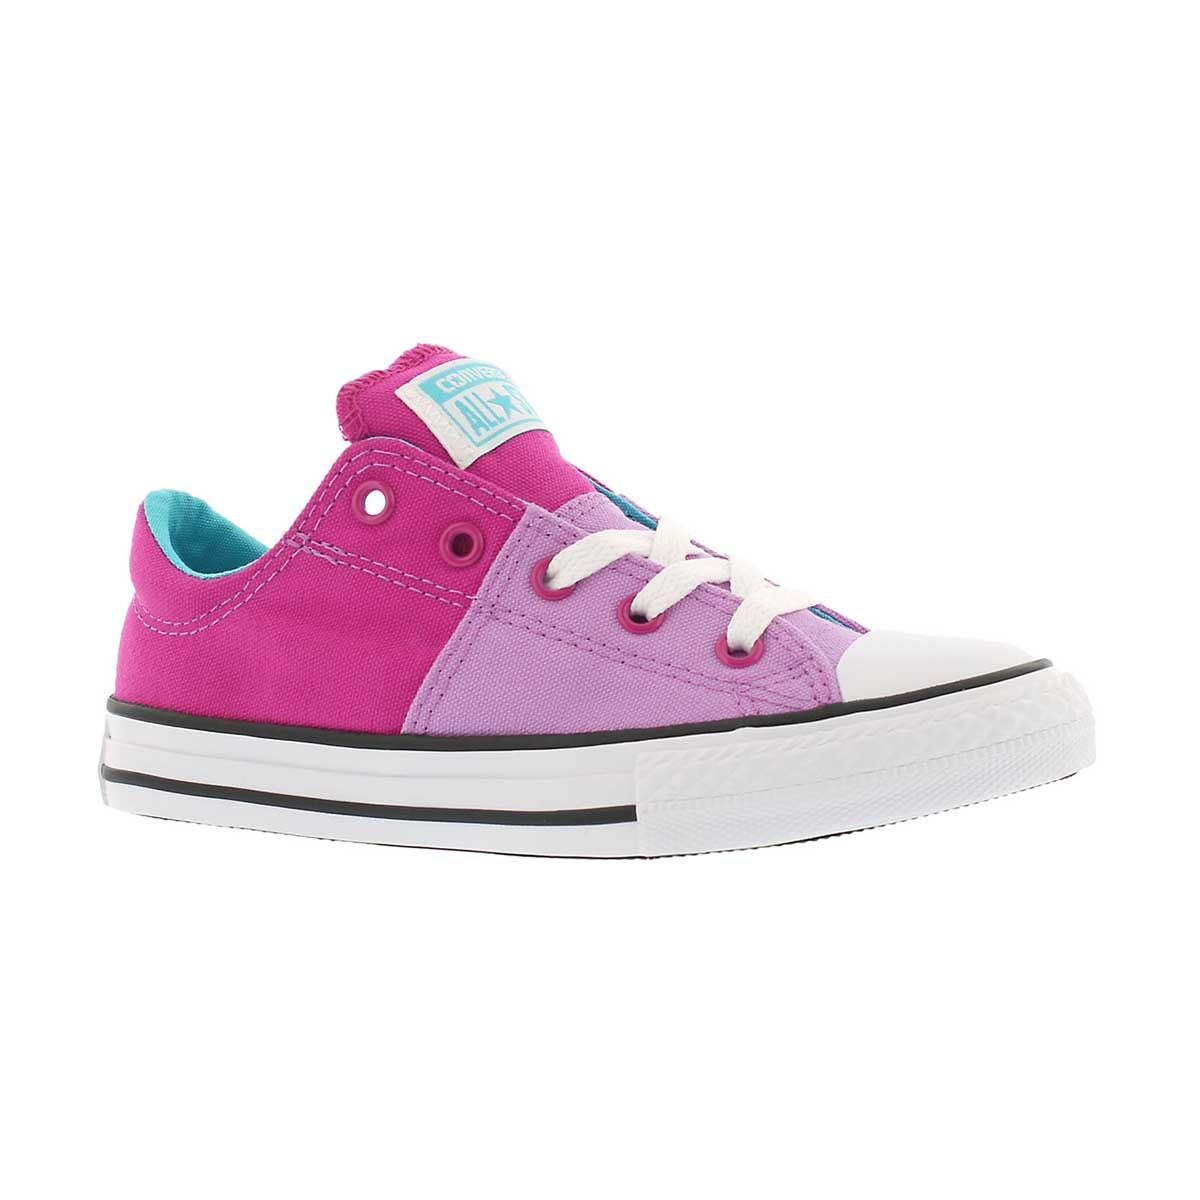 Girls' CT ALL STAR MADISON fuchsia/mgnta sneakers